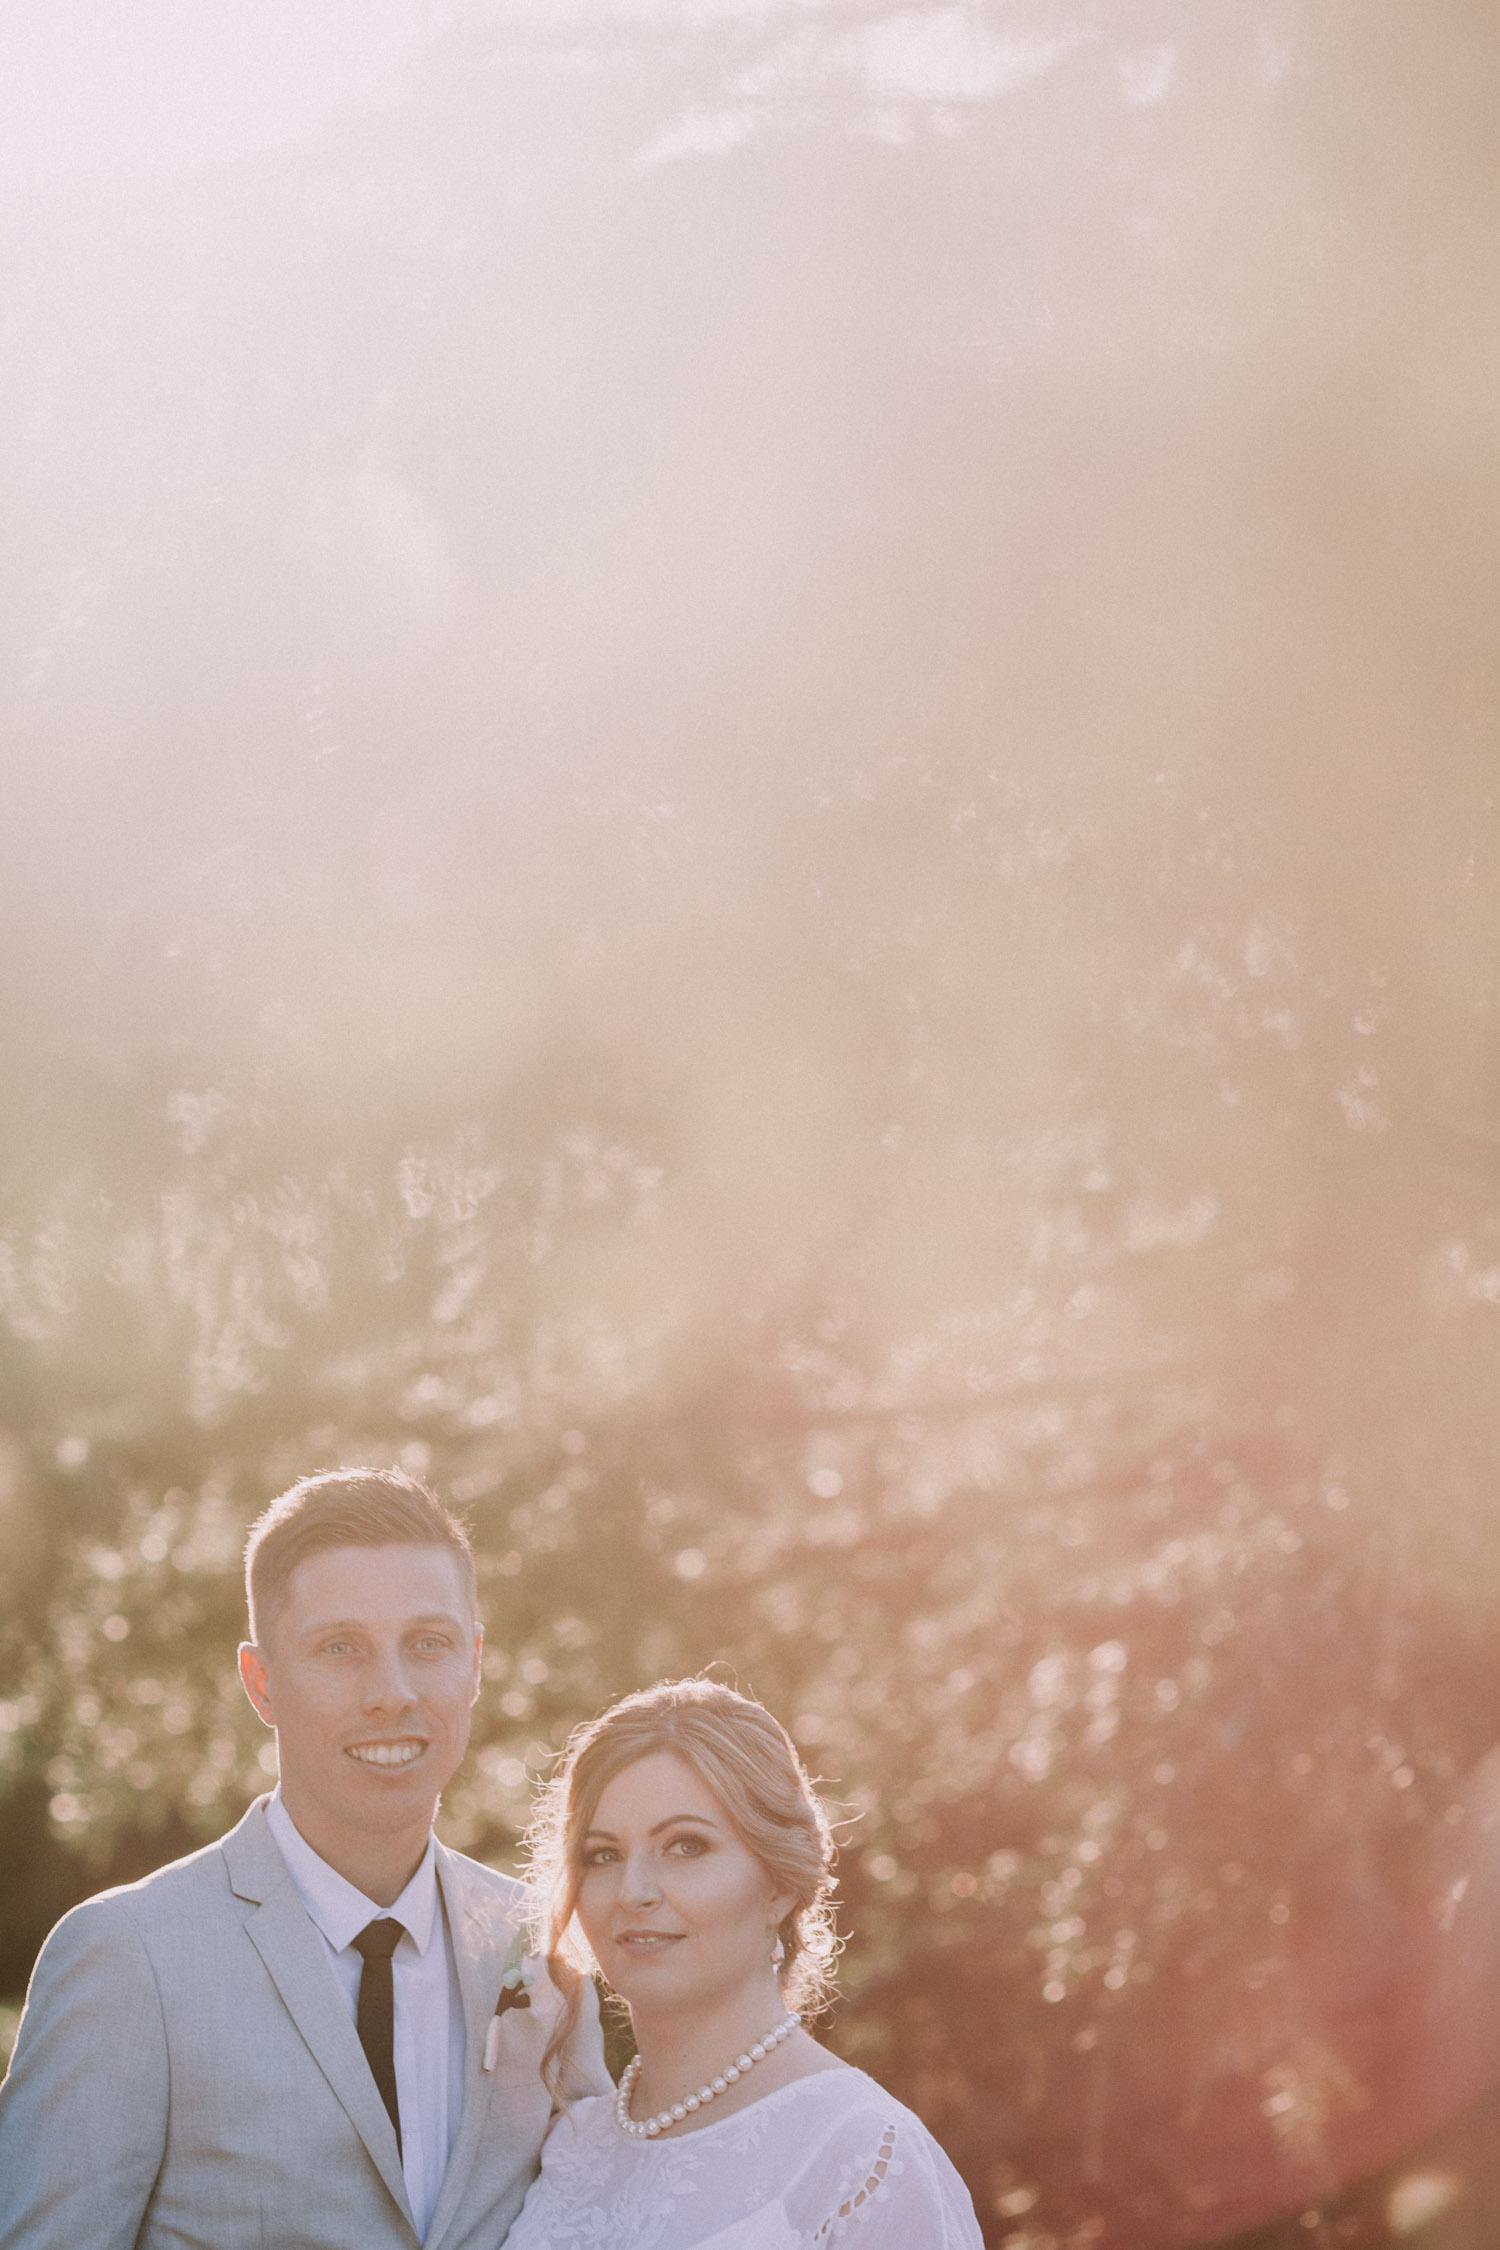 country-garden-wedding-5.jpg